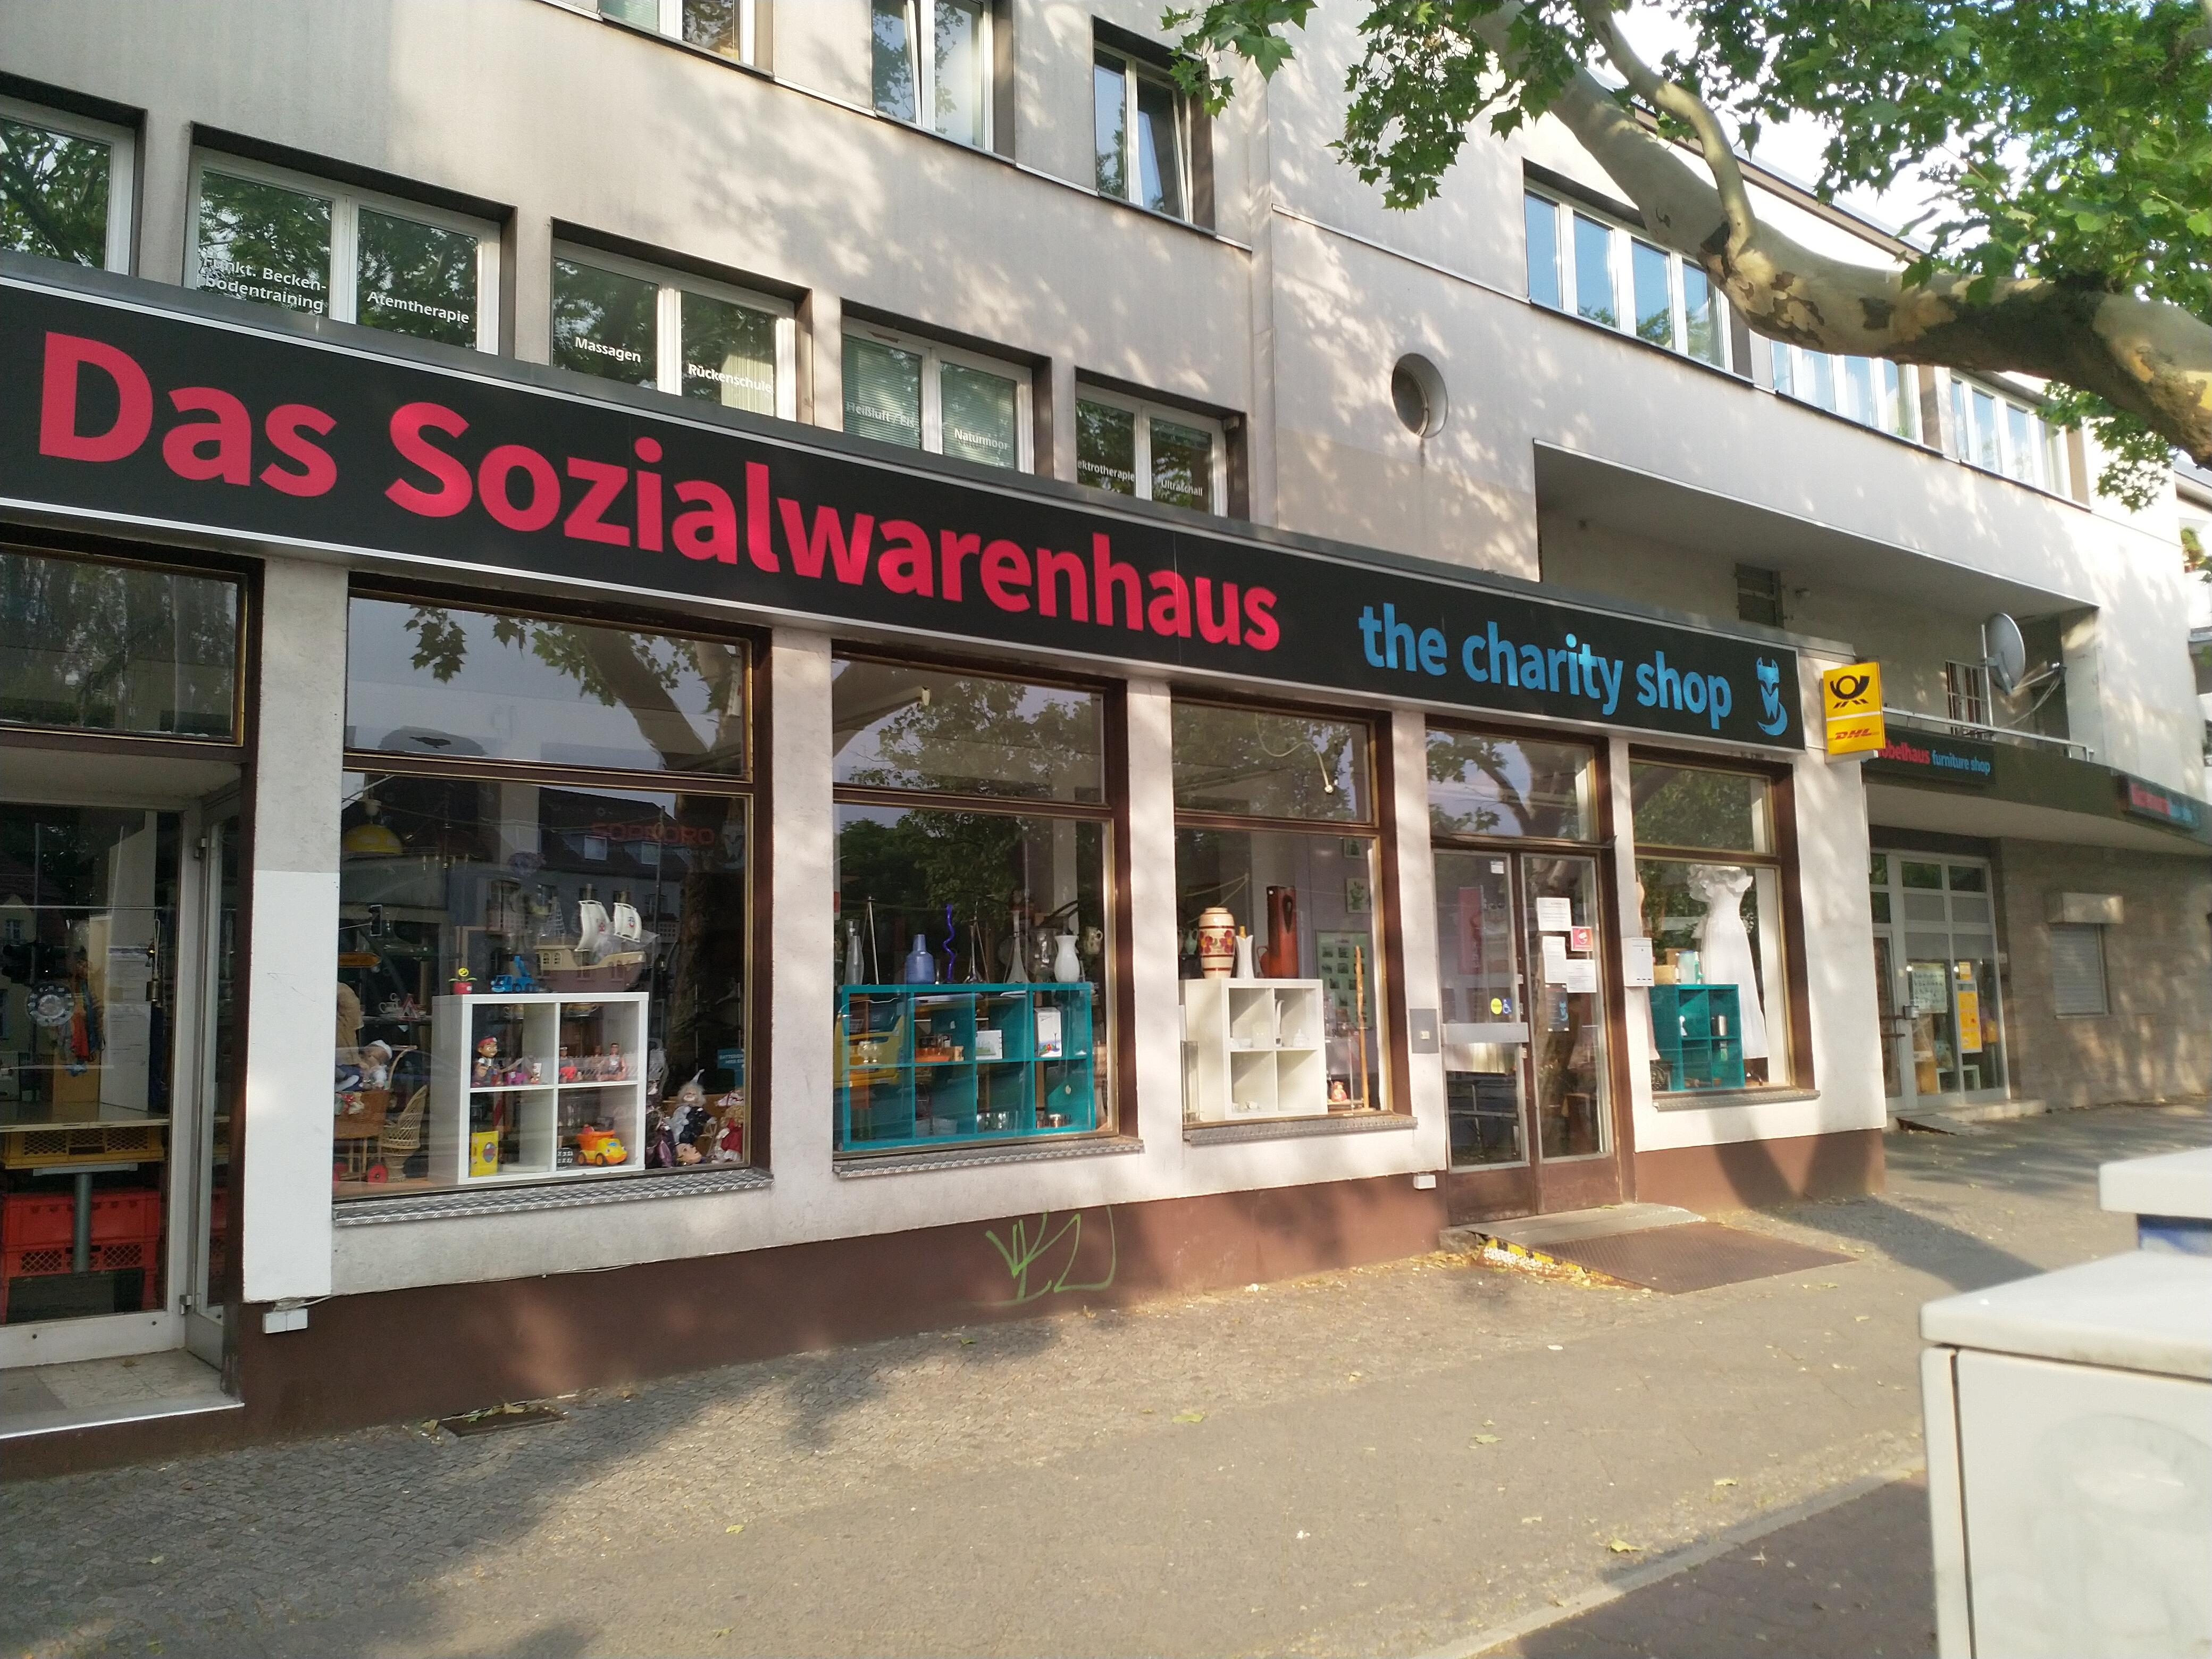 Sozialwarenhaus